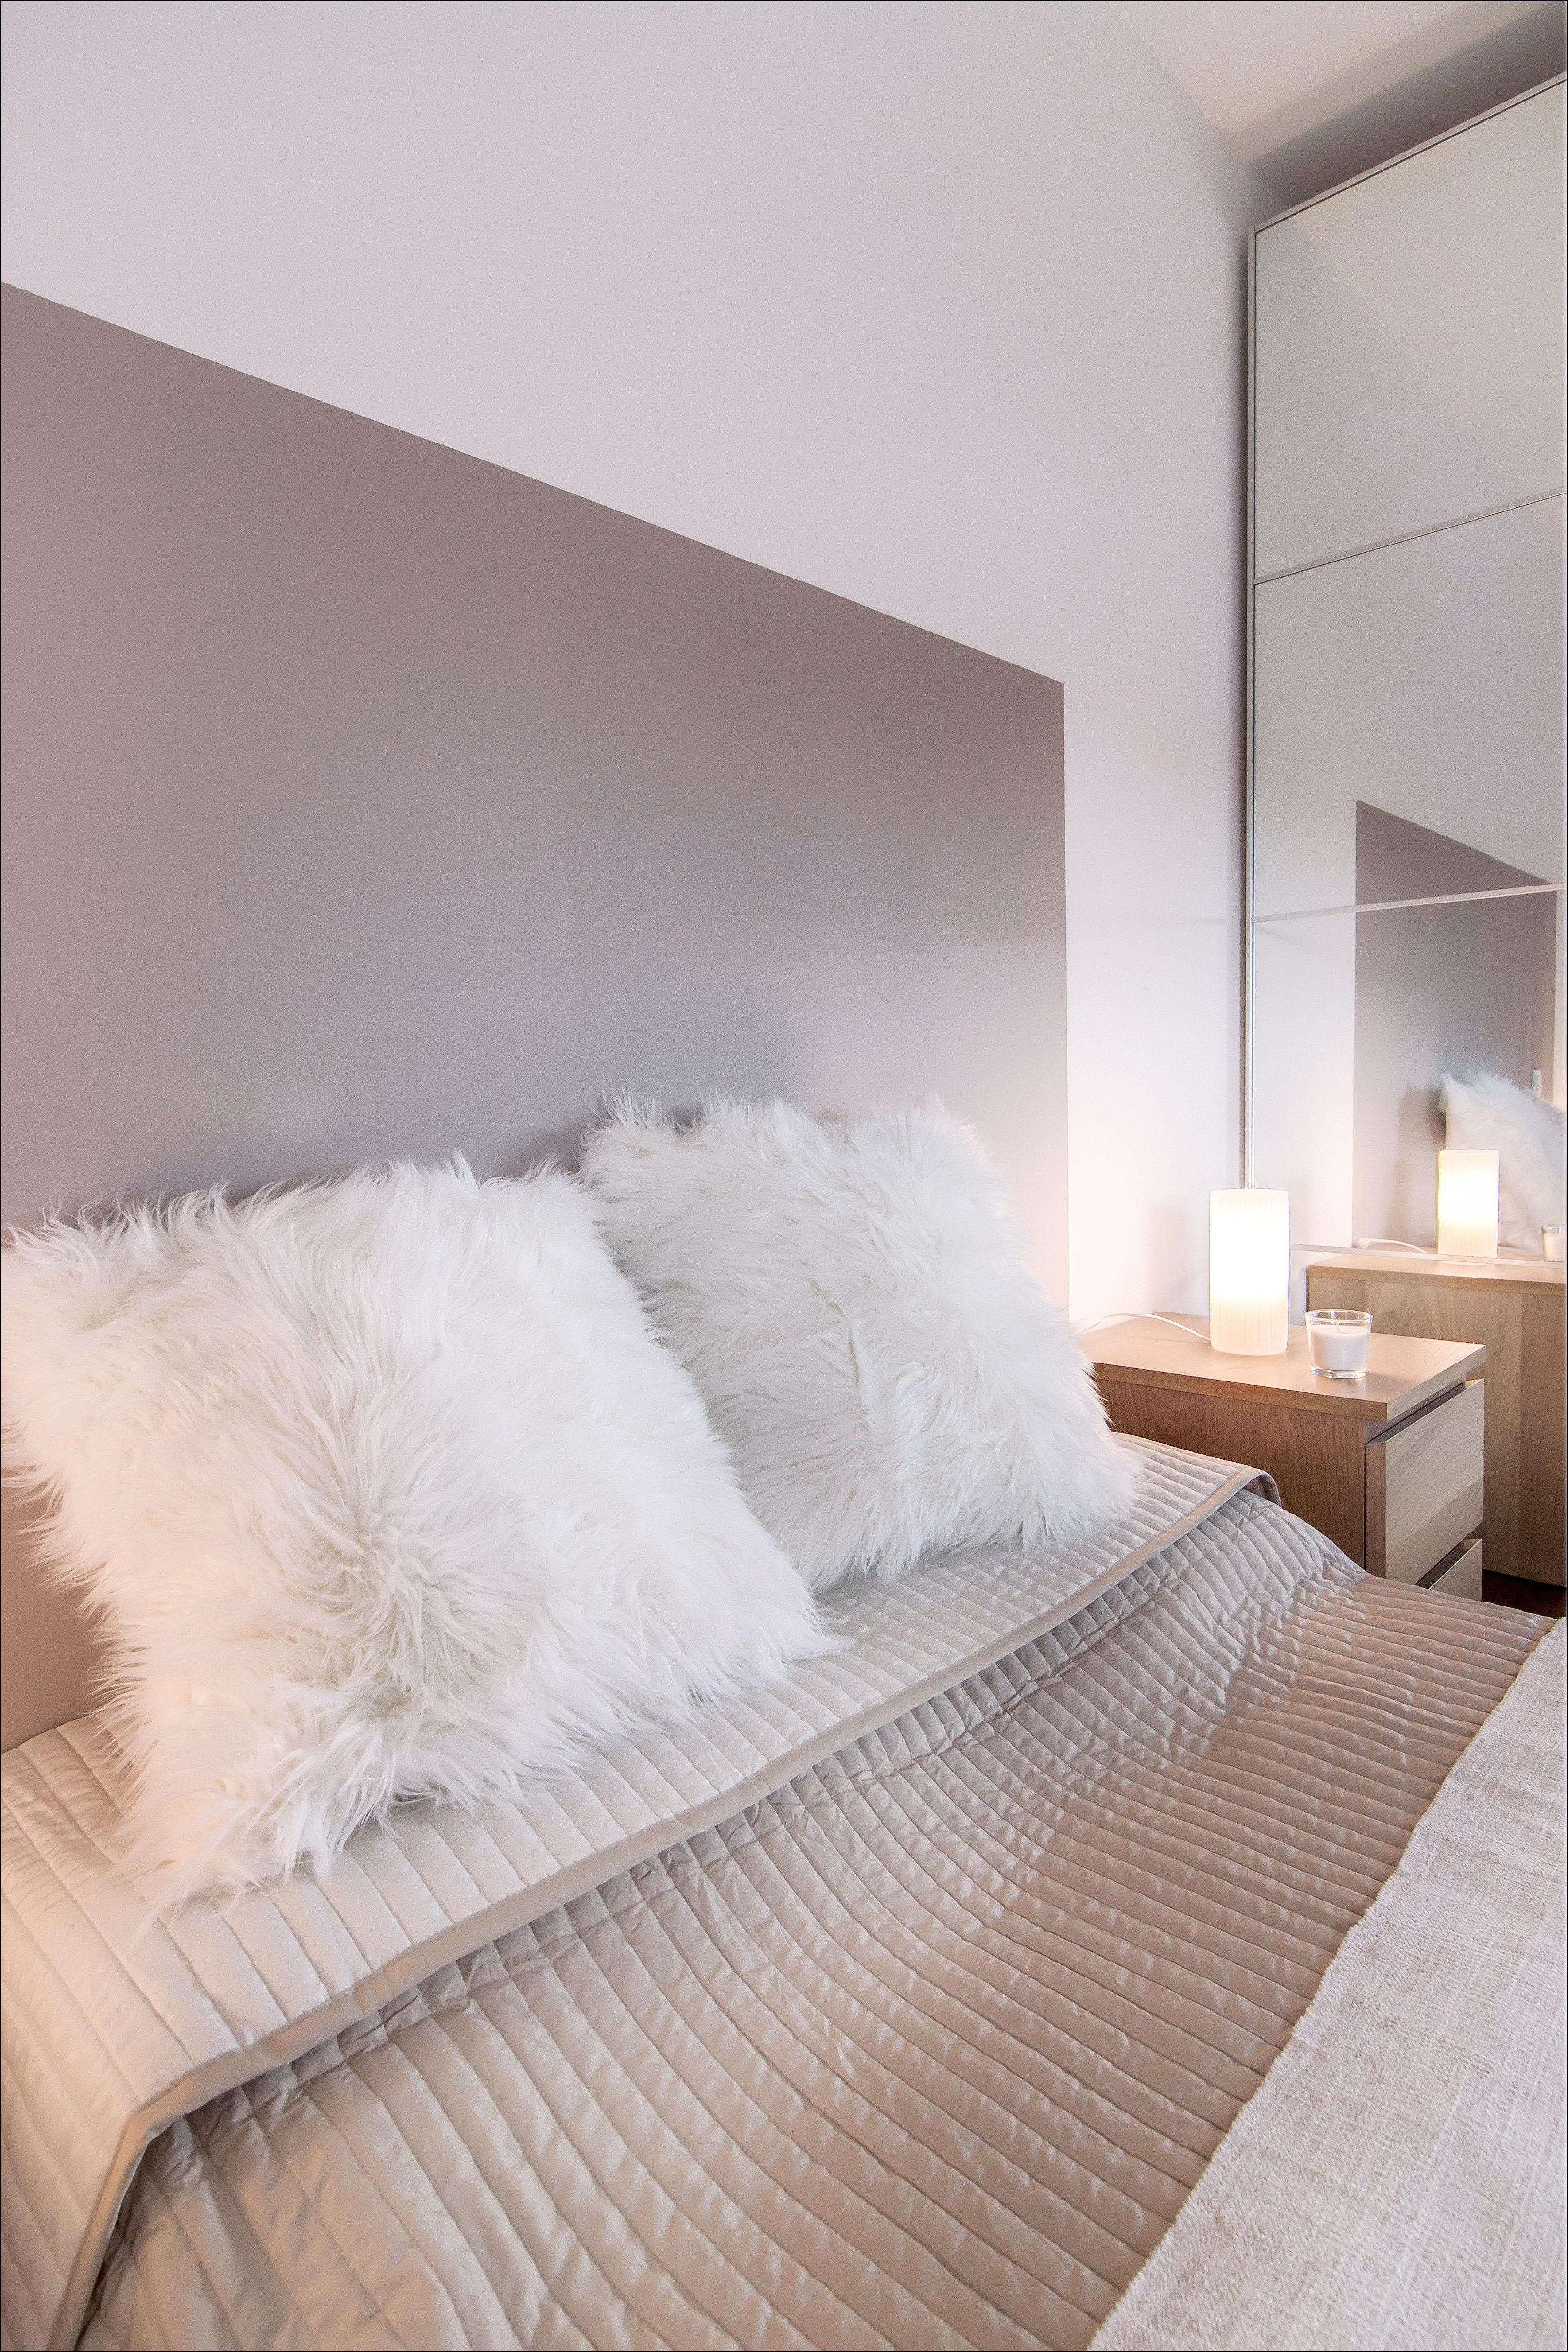 Deco Chambre Avec Tete De Lit Taupe White Bedroom Cozy White